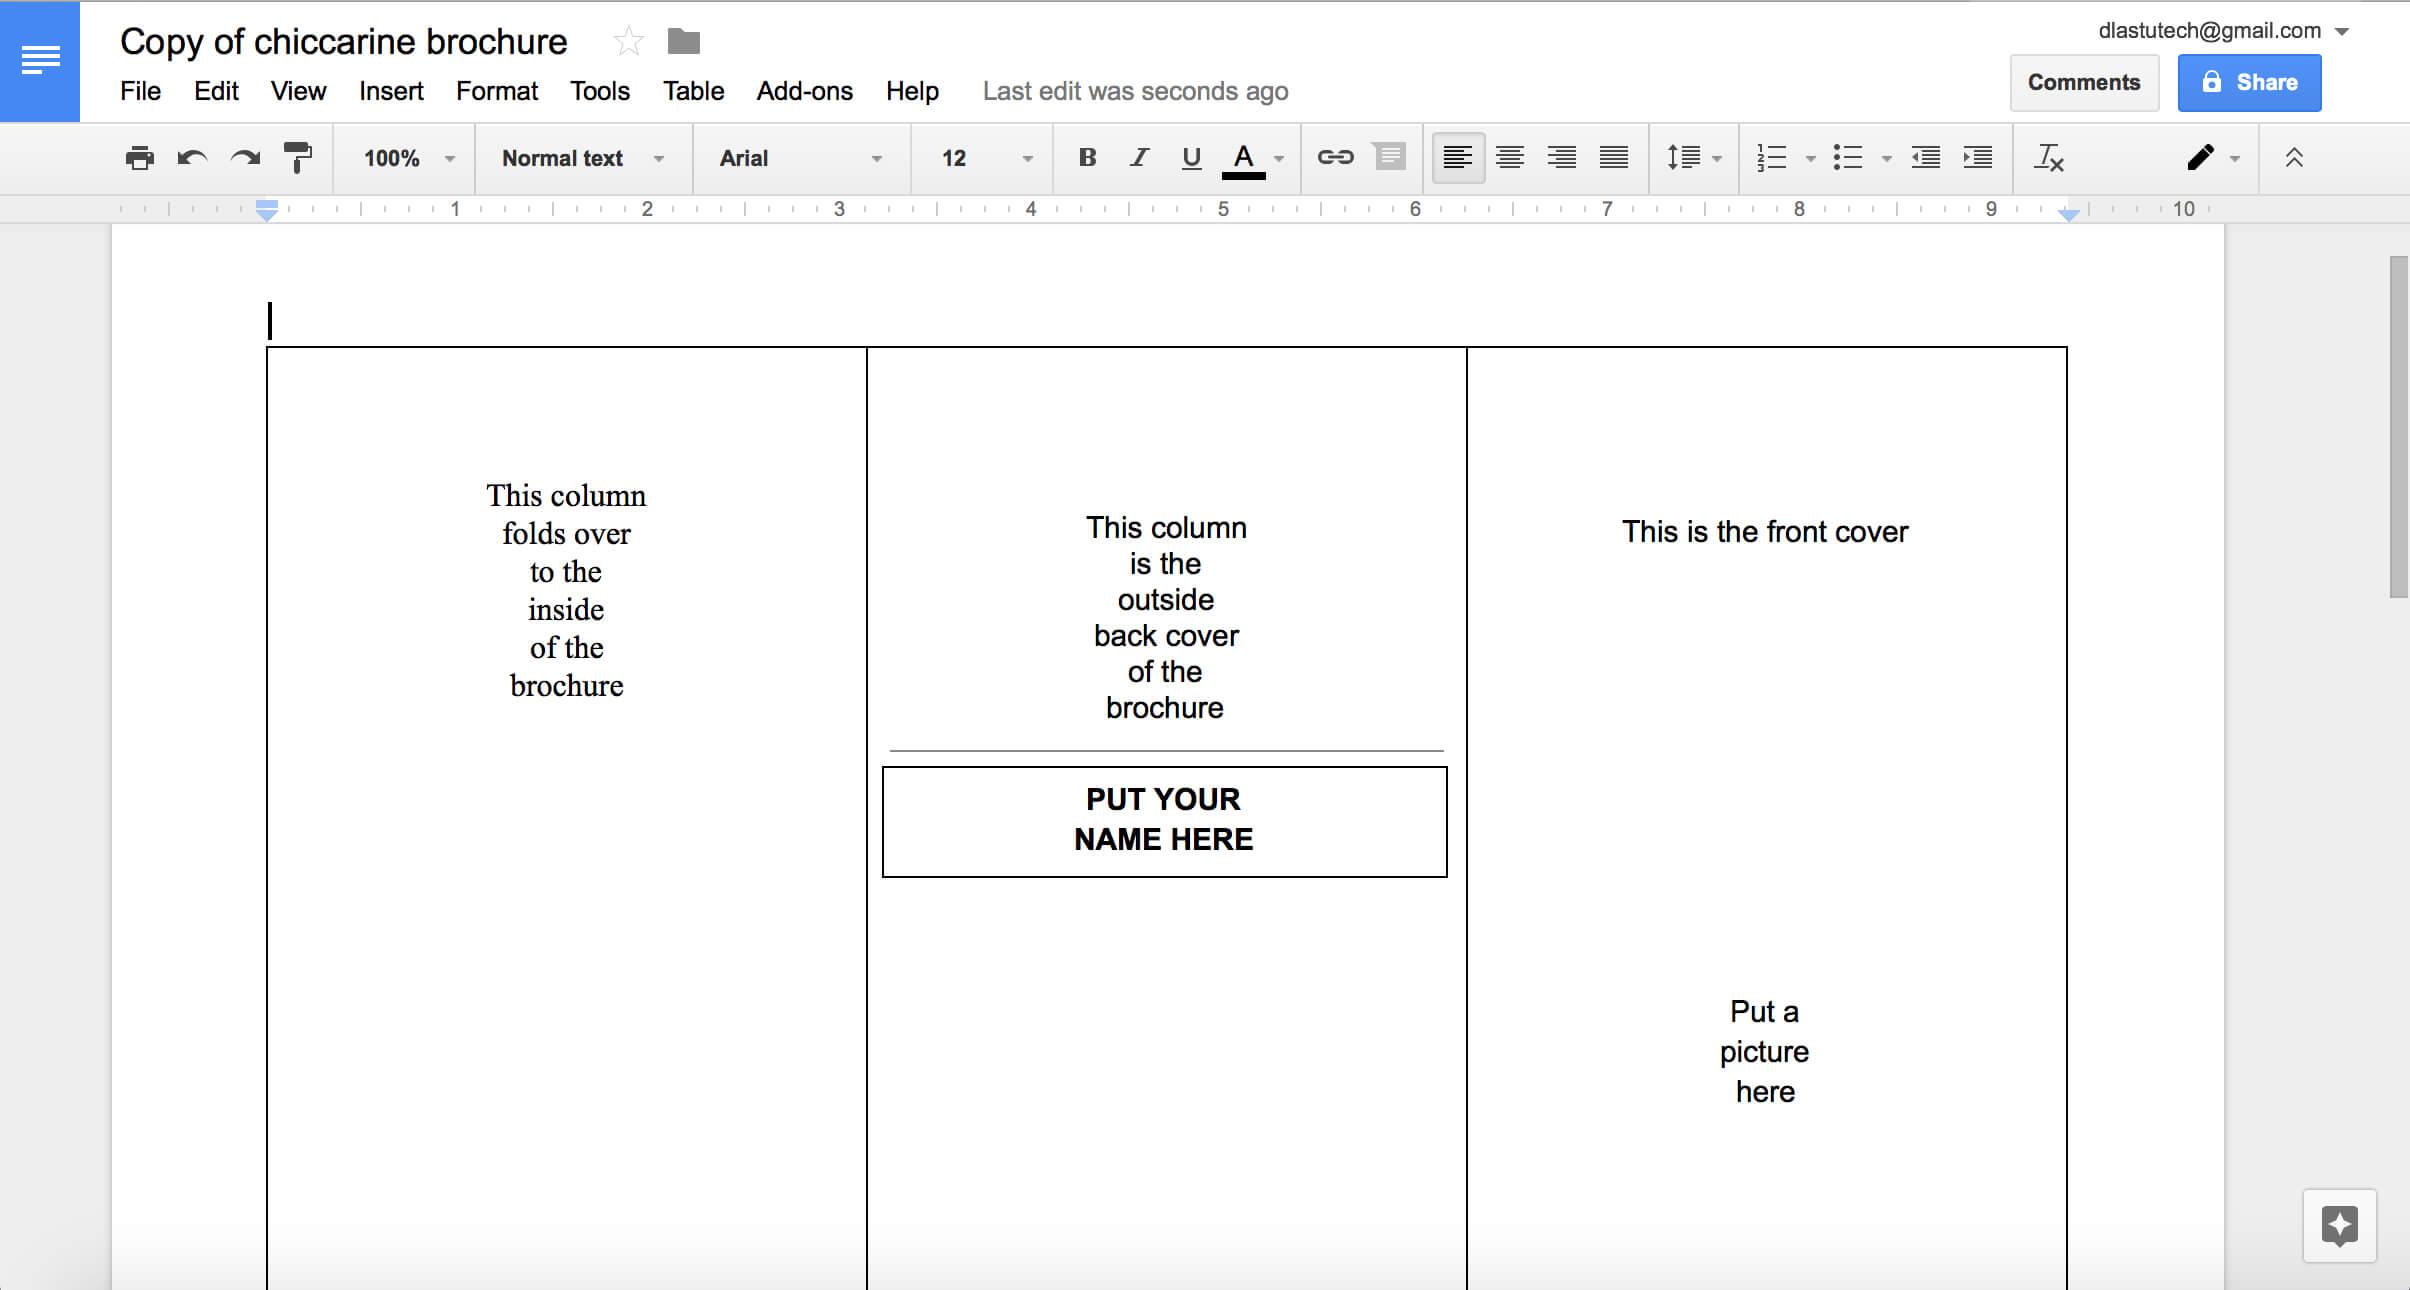 019 Blank Tri Fold Brochure Template Google Slides Ideas For Brochure Template For Google Docs